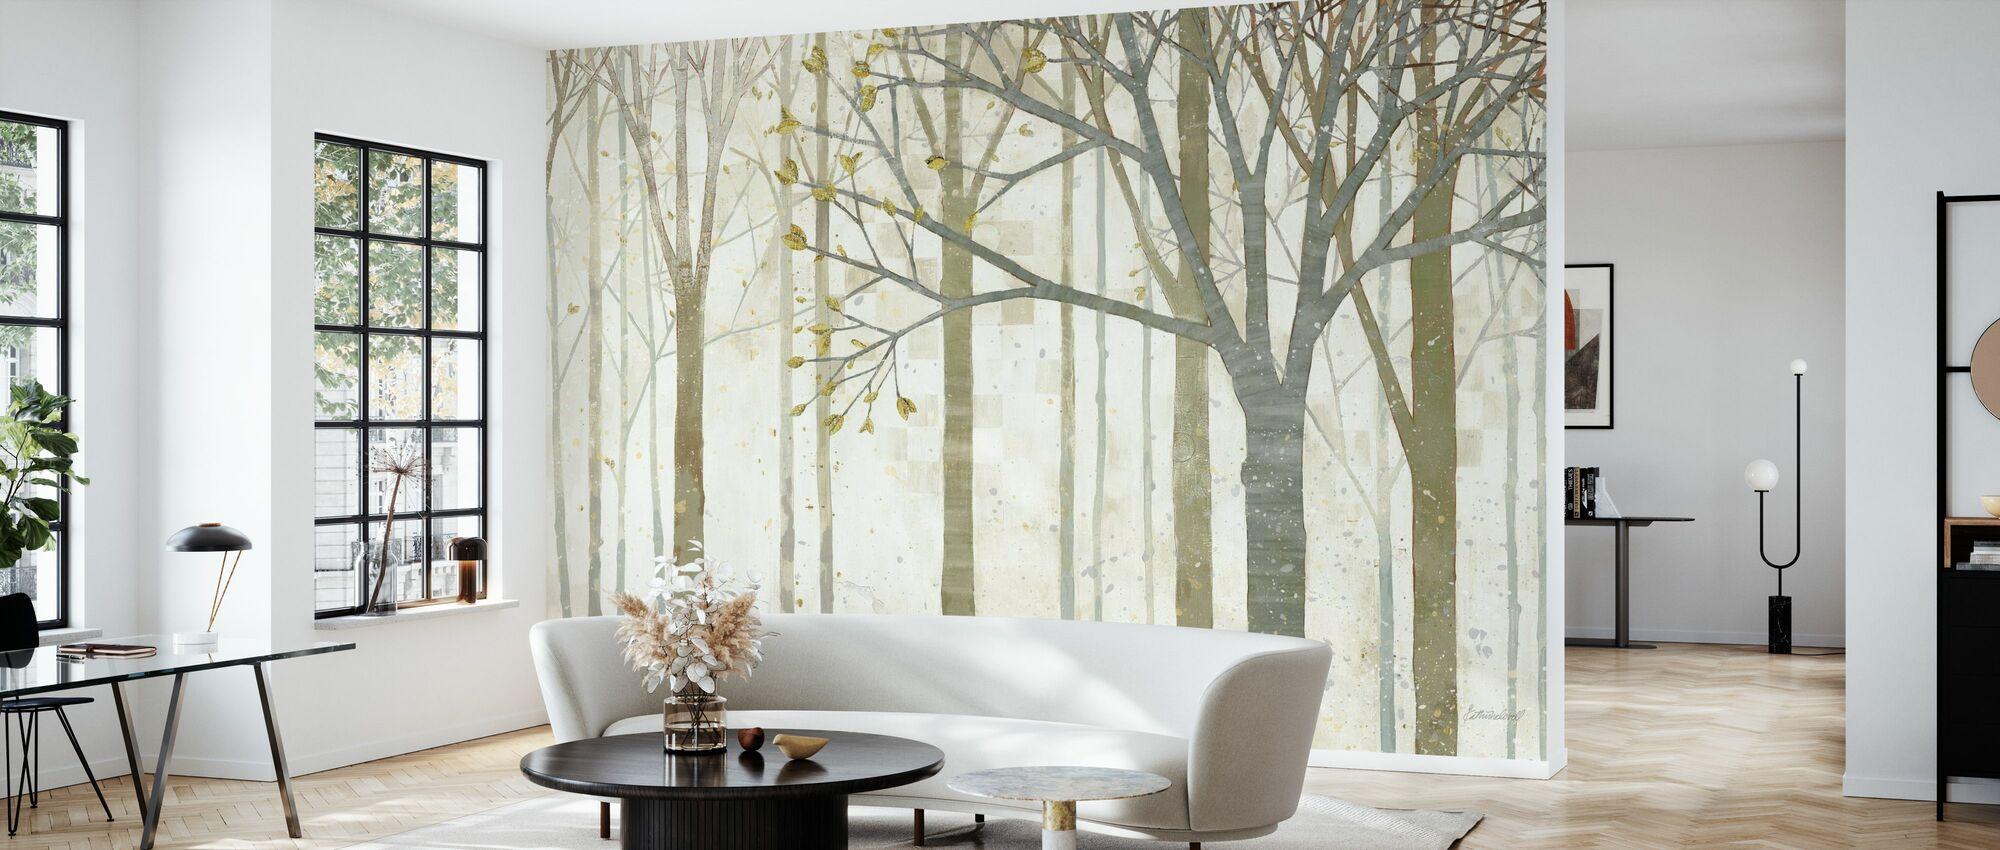 In Springtime - Wallpaper - Living Room